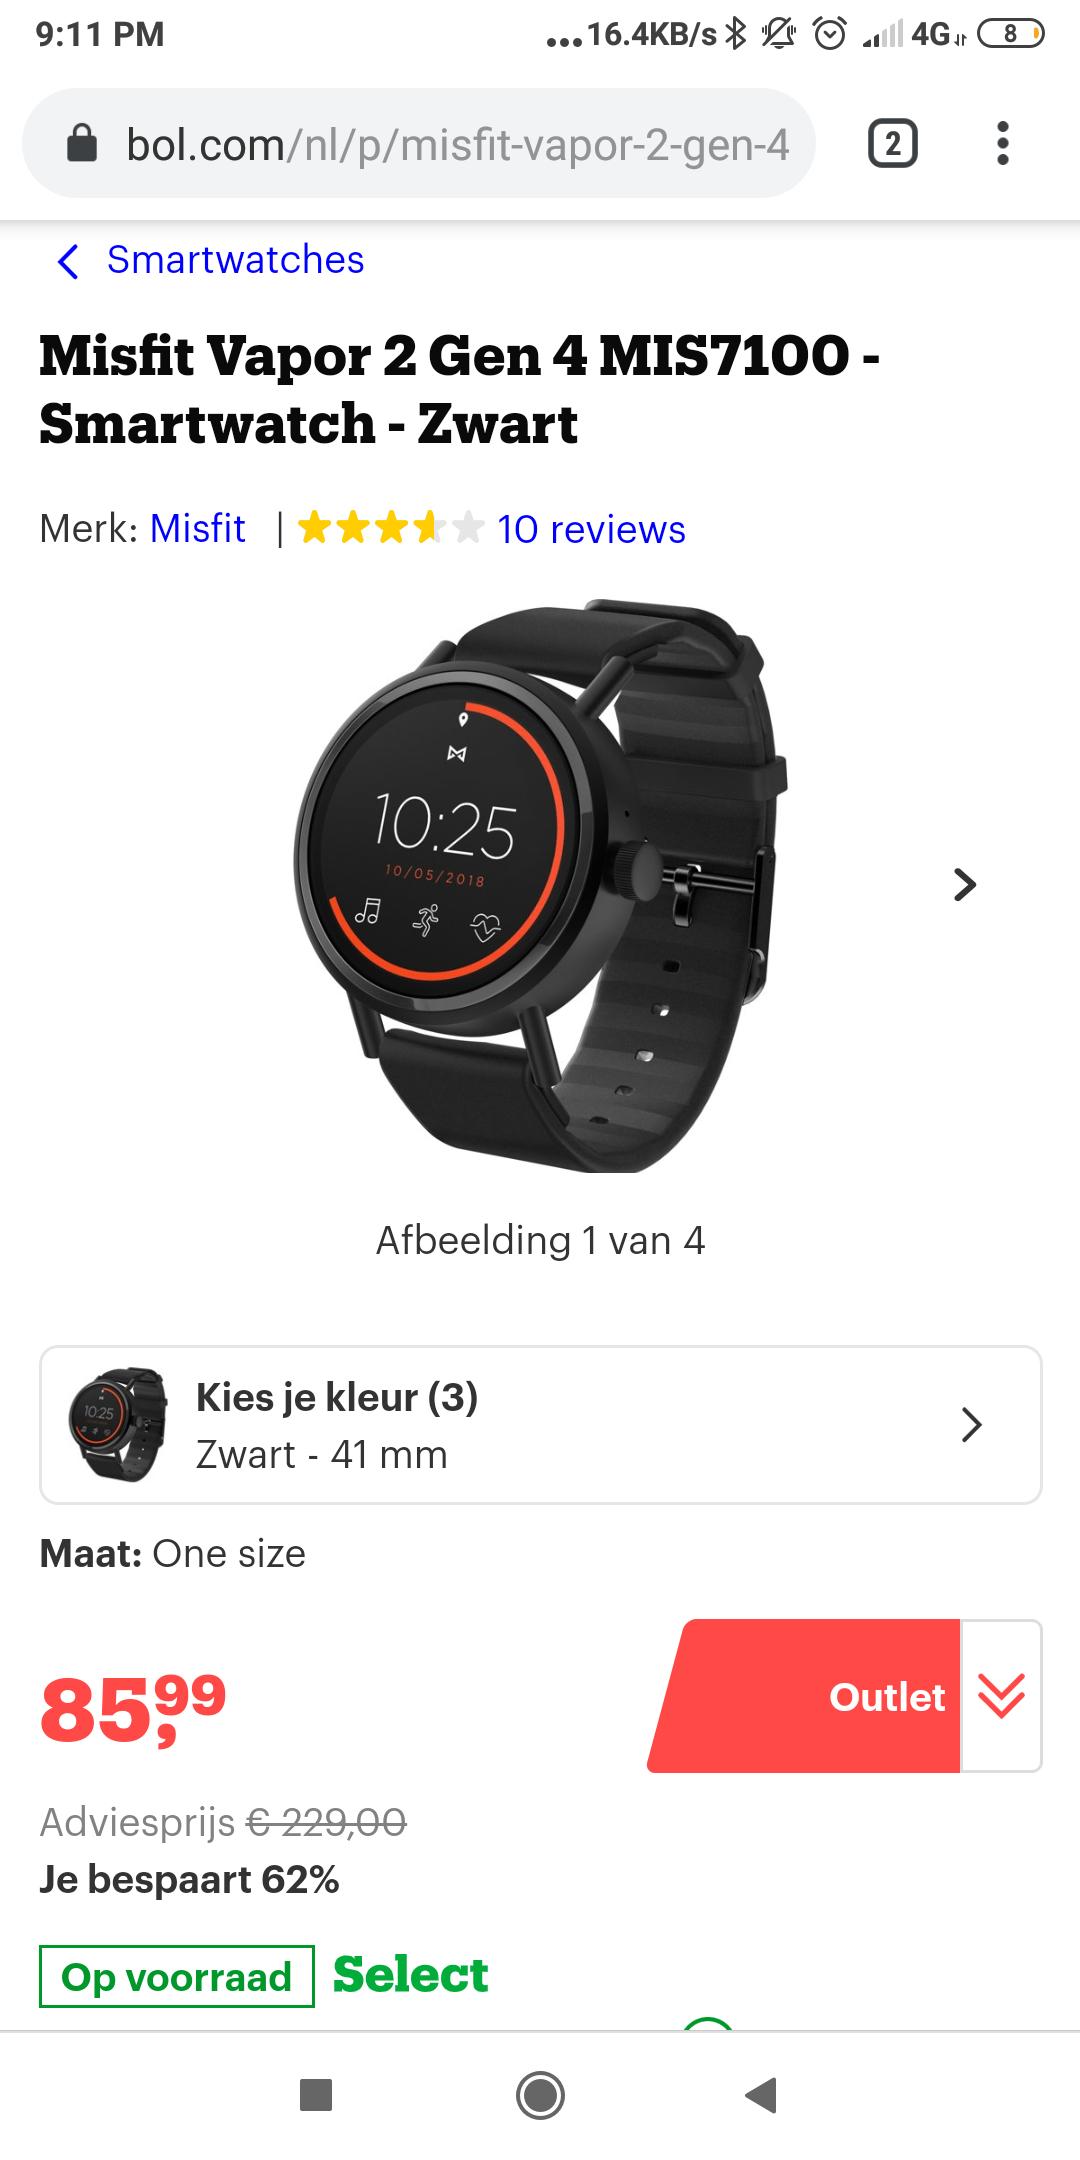 Misfit Vapor 2 Gen 4 MIS7100 - Smartwatch